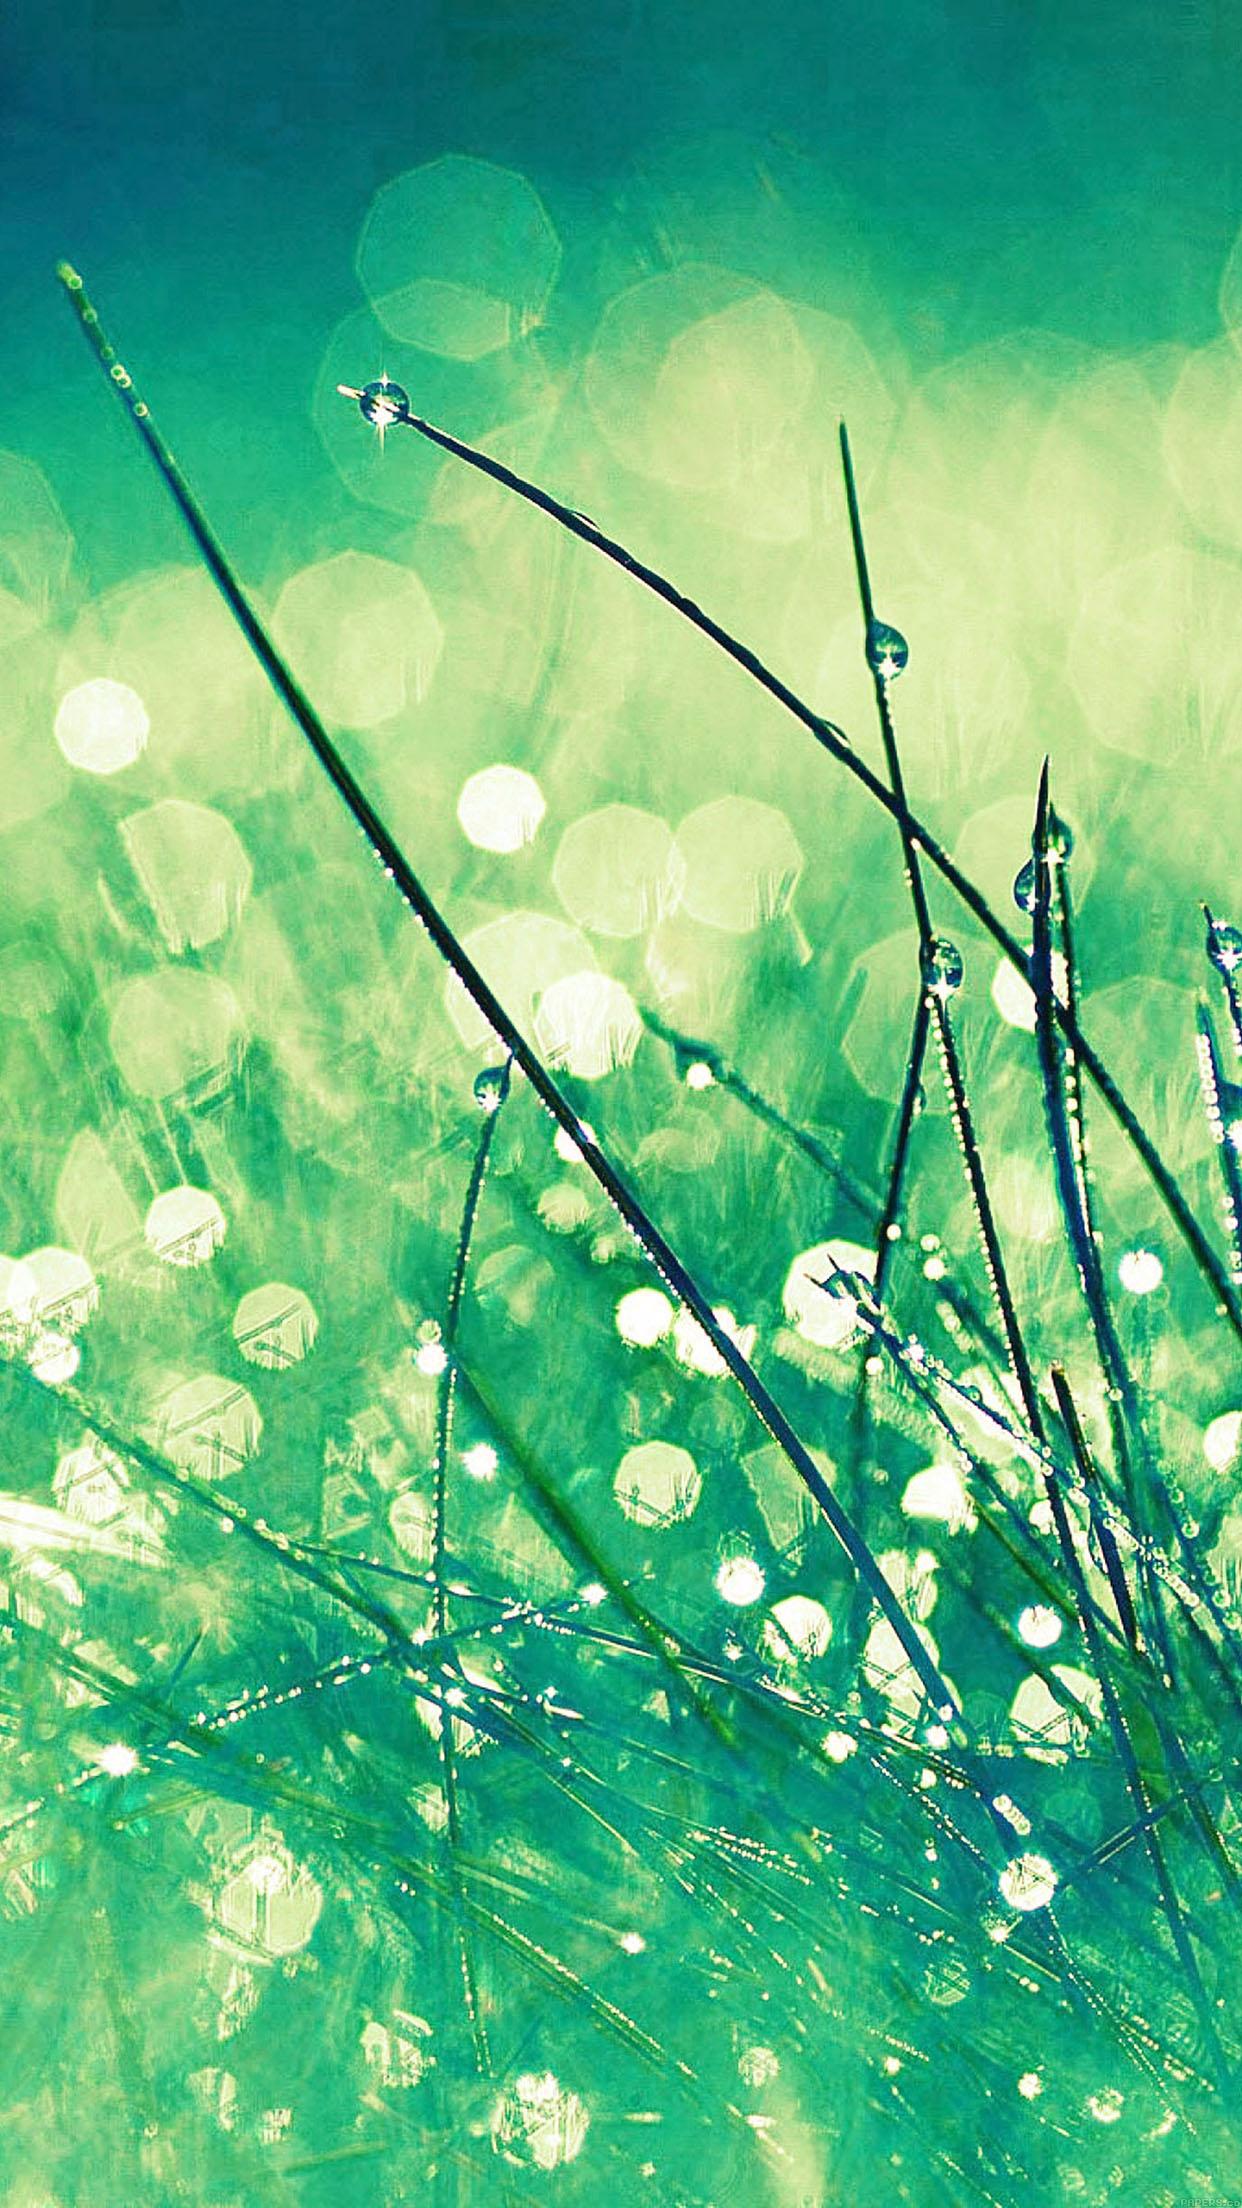 Lg Optimus 3d Wallpaper Mc02 Wallpaper Grass Dew Greener Leaf Papers Co